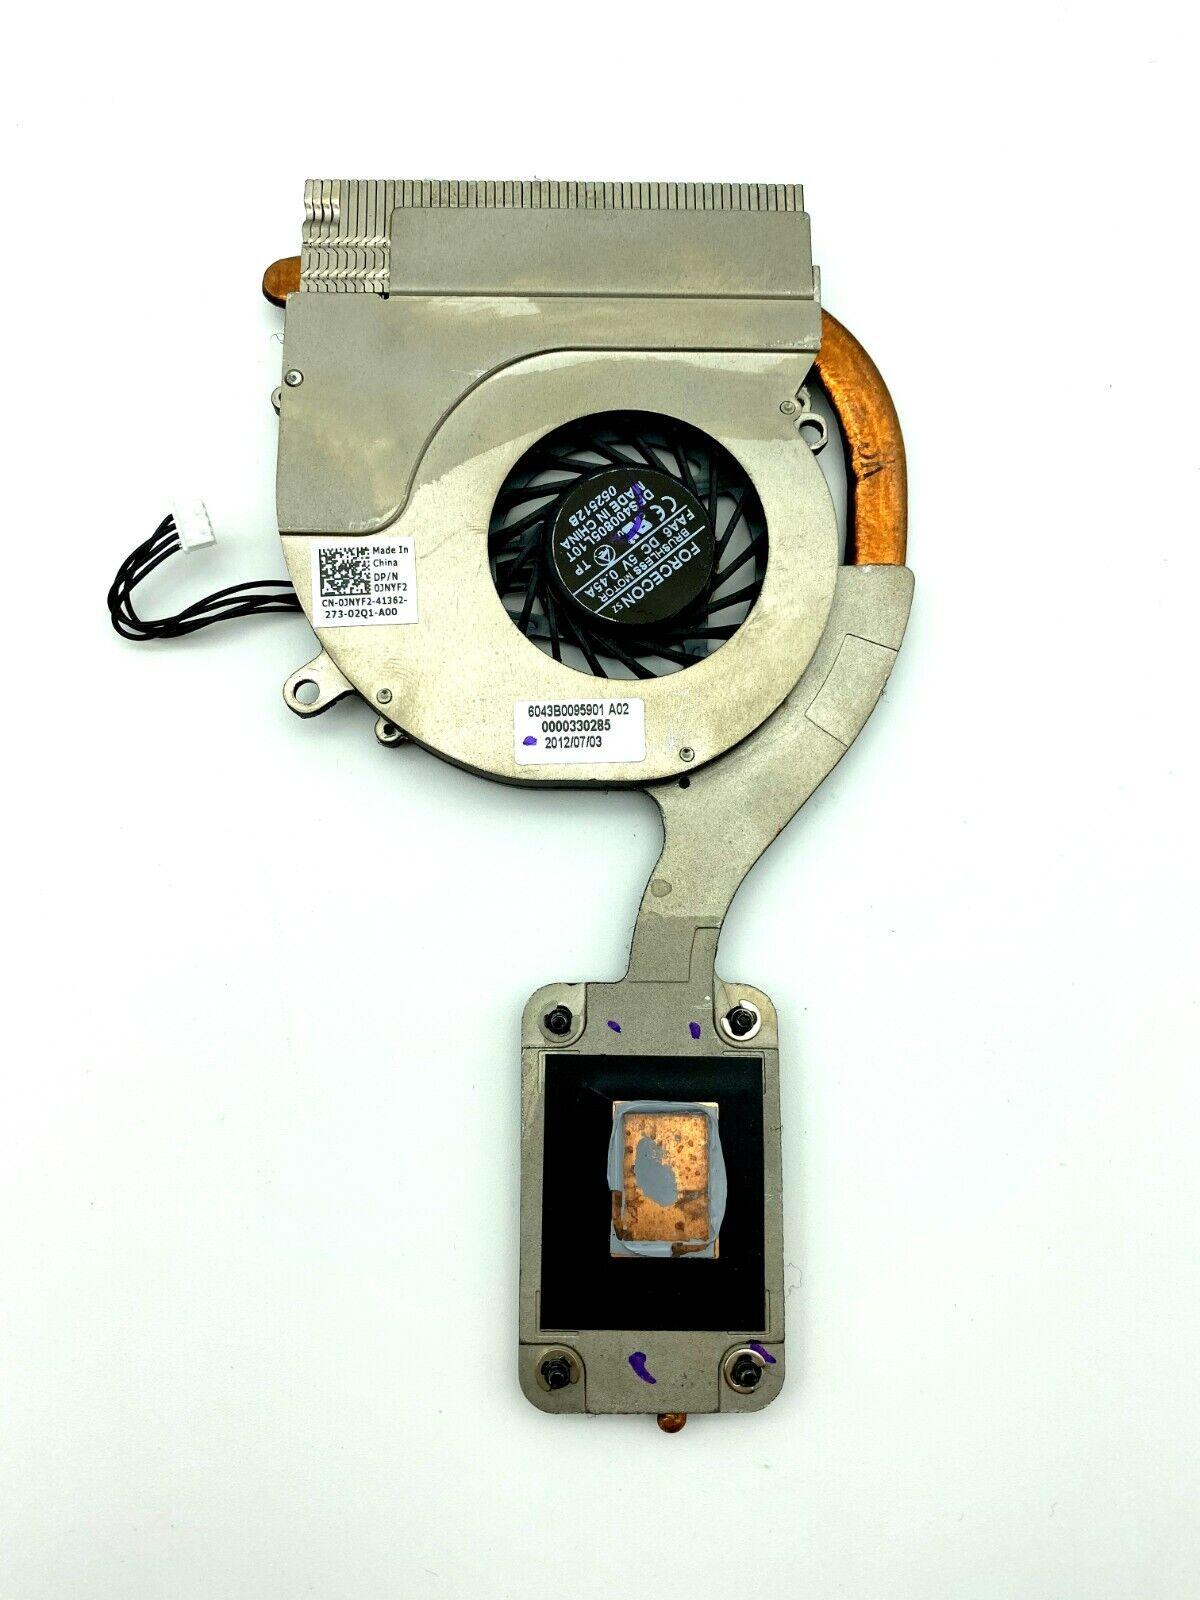 Original For Dell Latitude E6220 Cooling Fan with  Heatsink  DP//N 0JNYF2  JNYF2